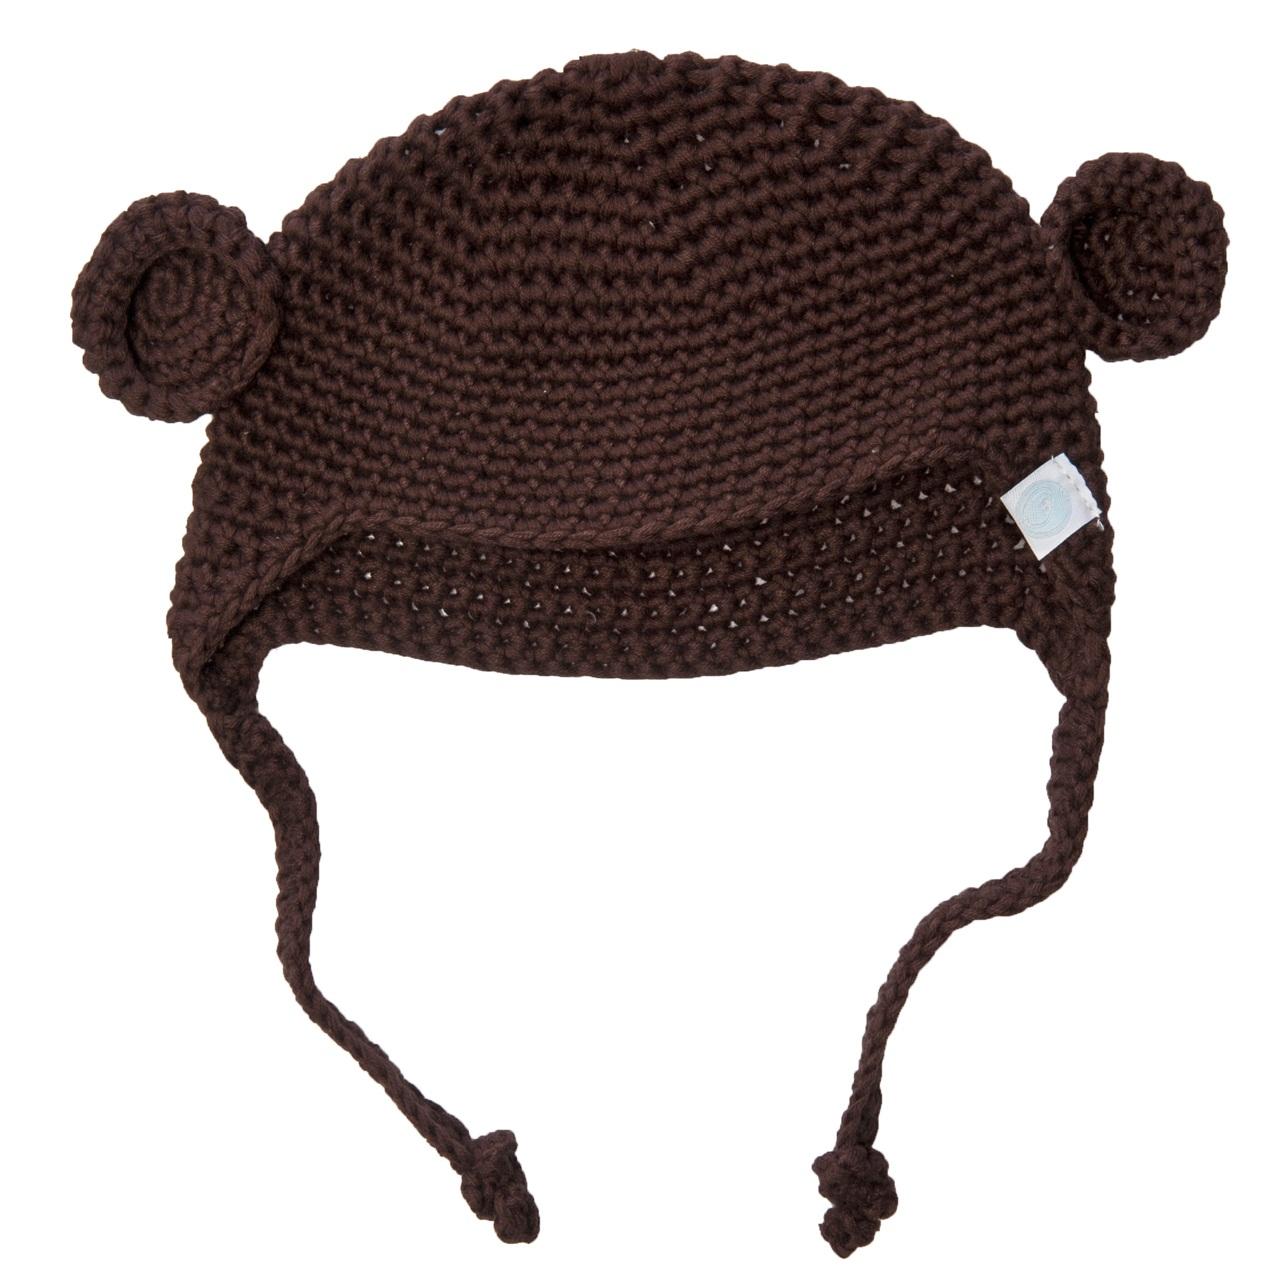 bebabean-crocet-bear-hat-gray-brown.jpg